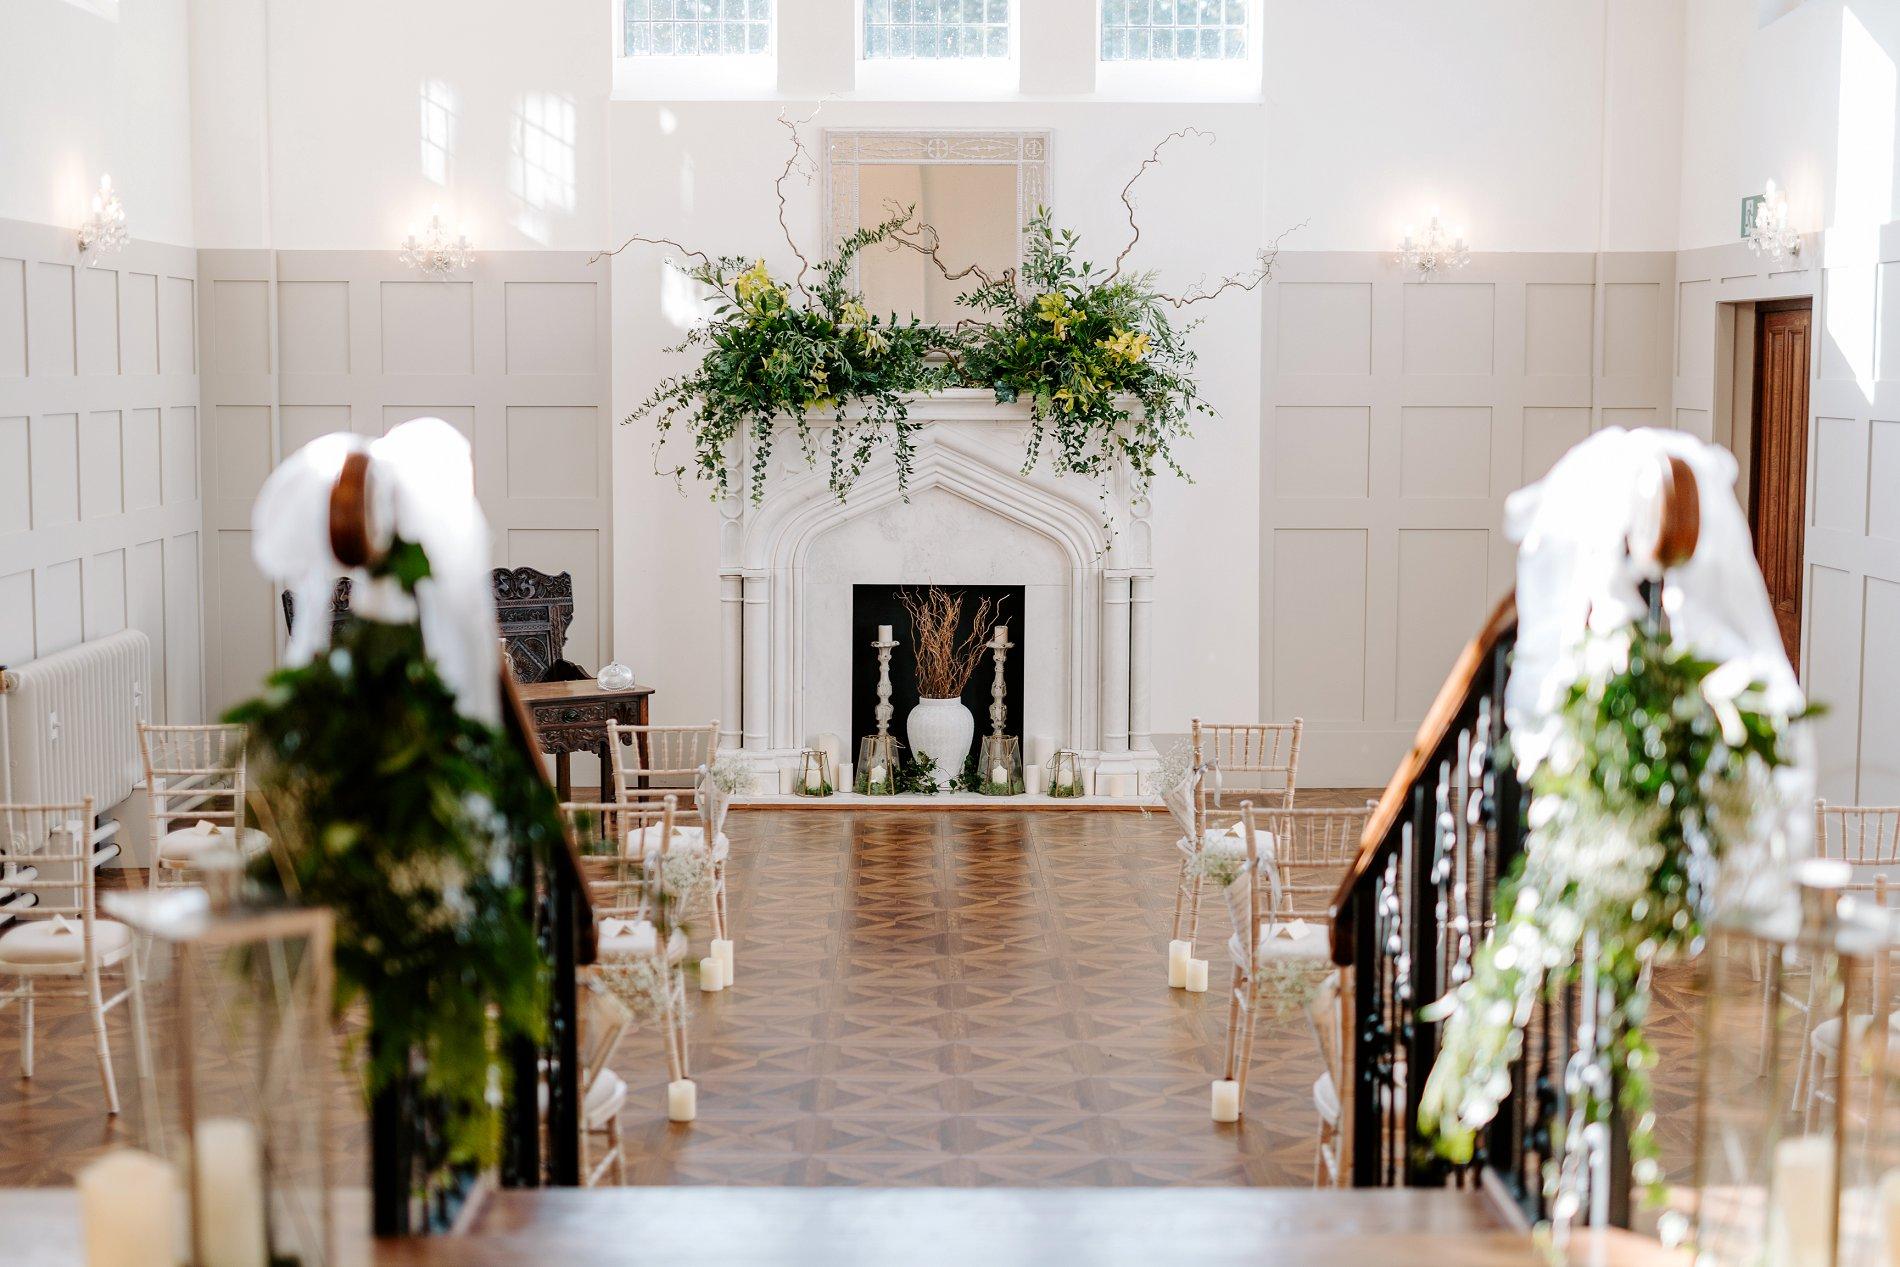 An Elegant White Wedding at Thicket Priory (c) Carla Whittingham Photography (5)